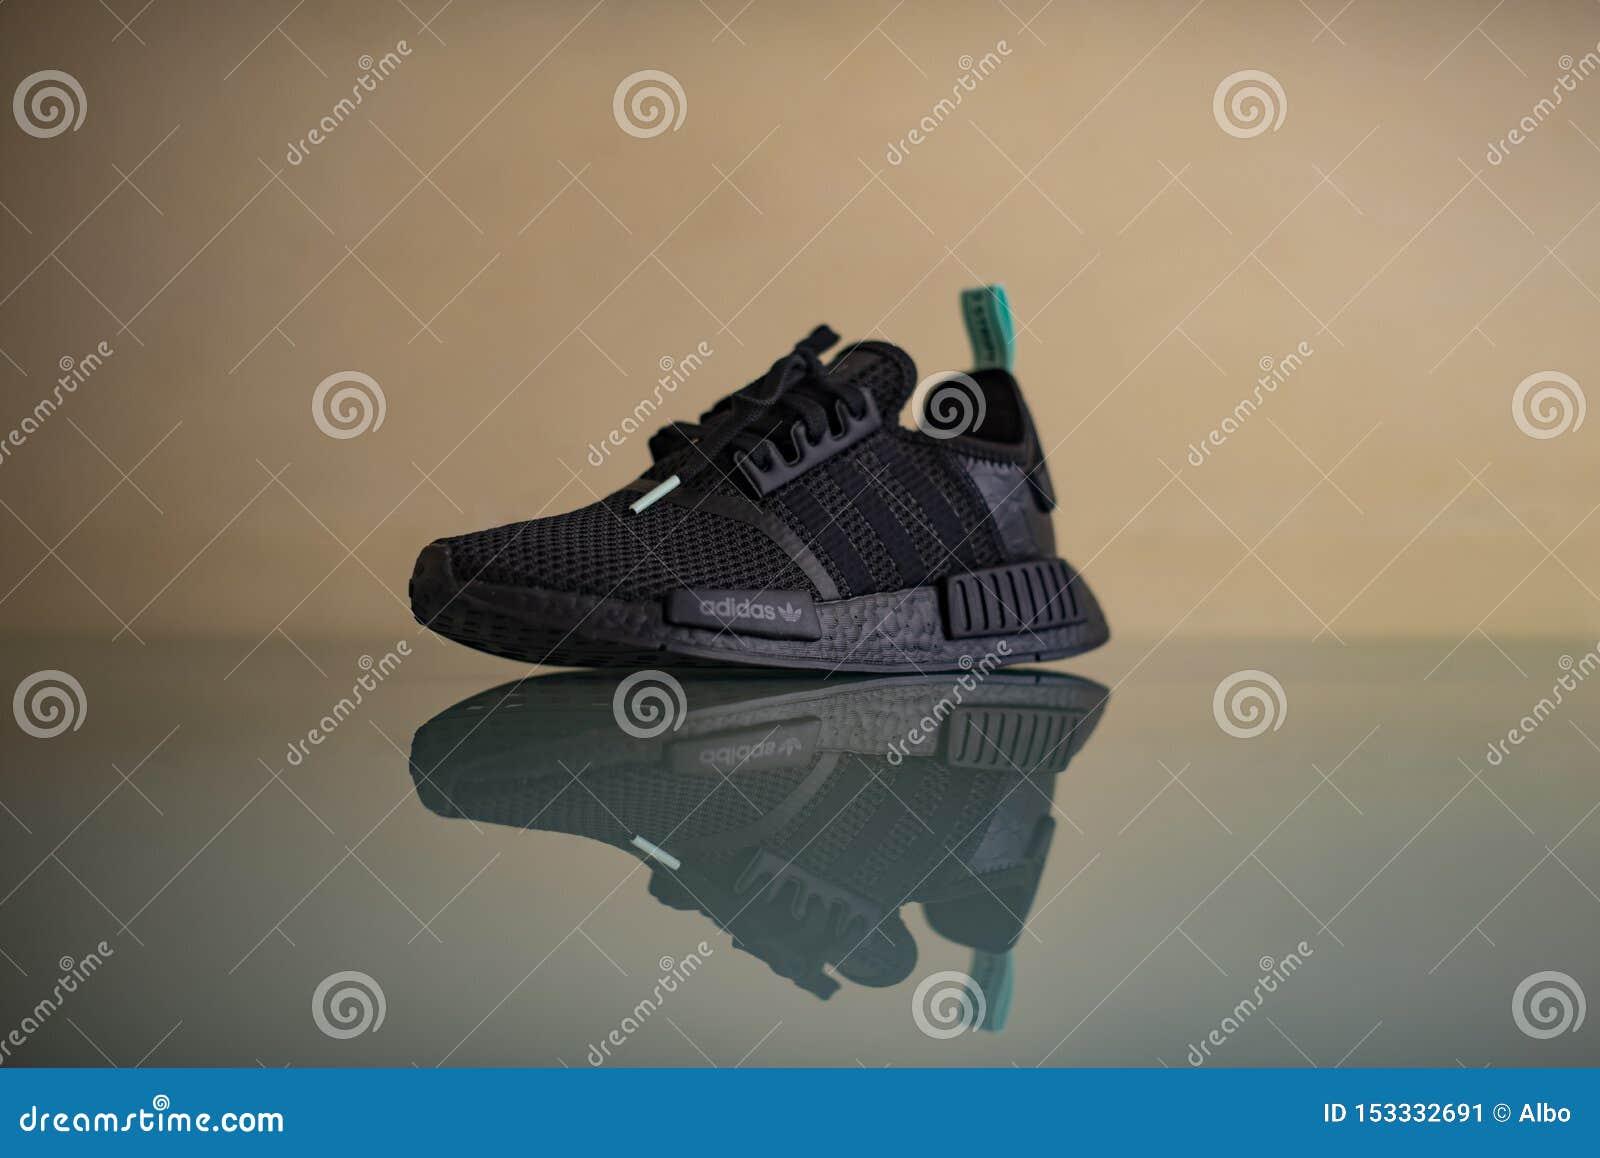 adidas italy nmd